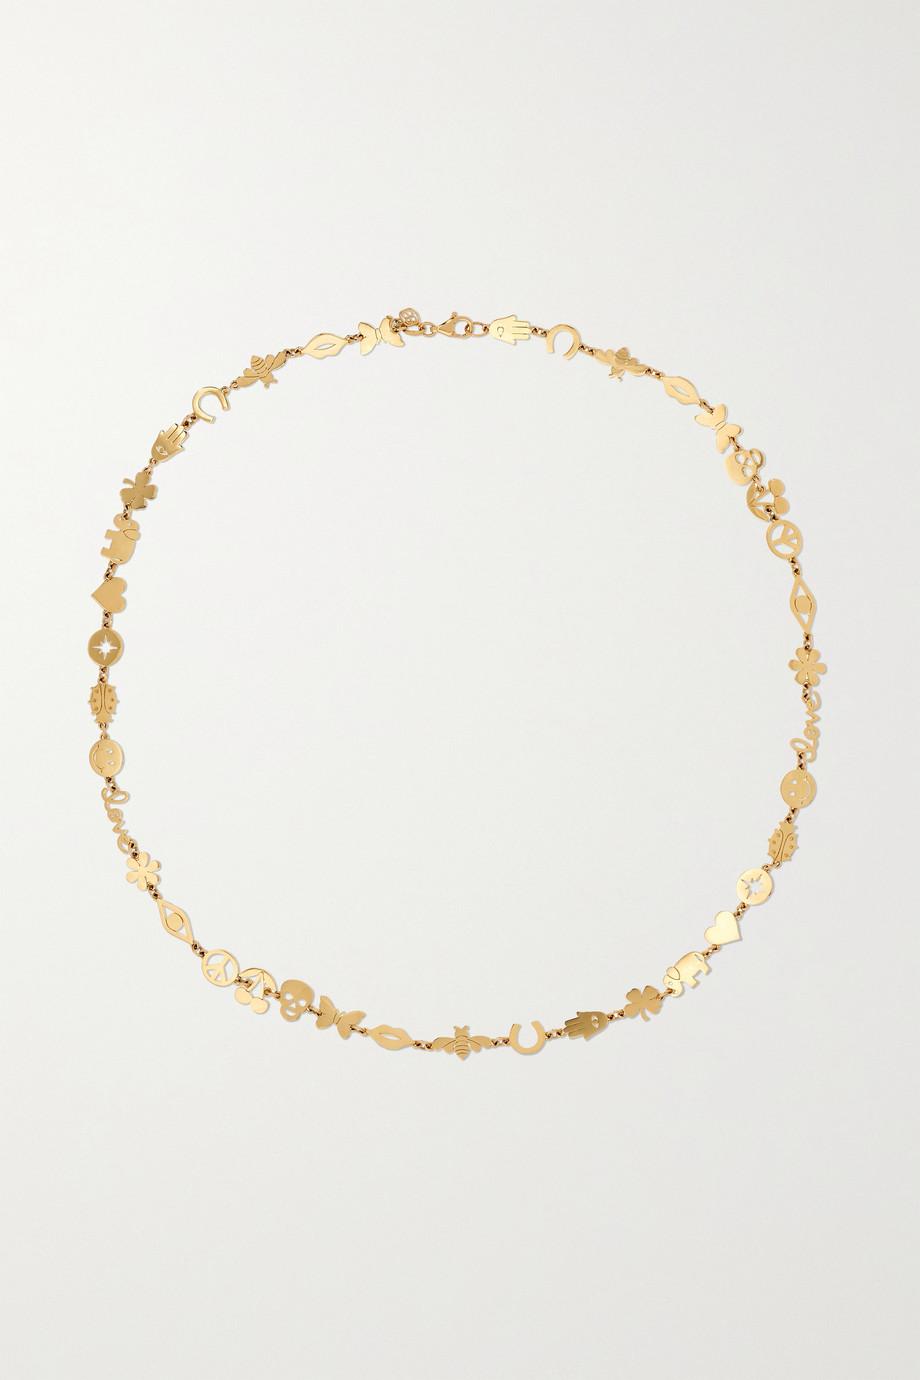 Sydney Evan Tiny Pure 14-karat gold necklace